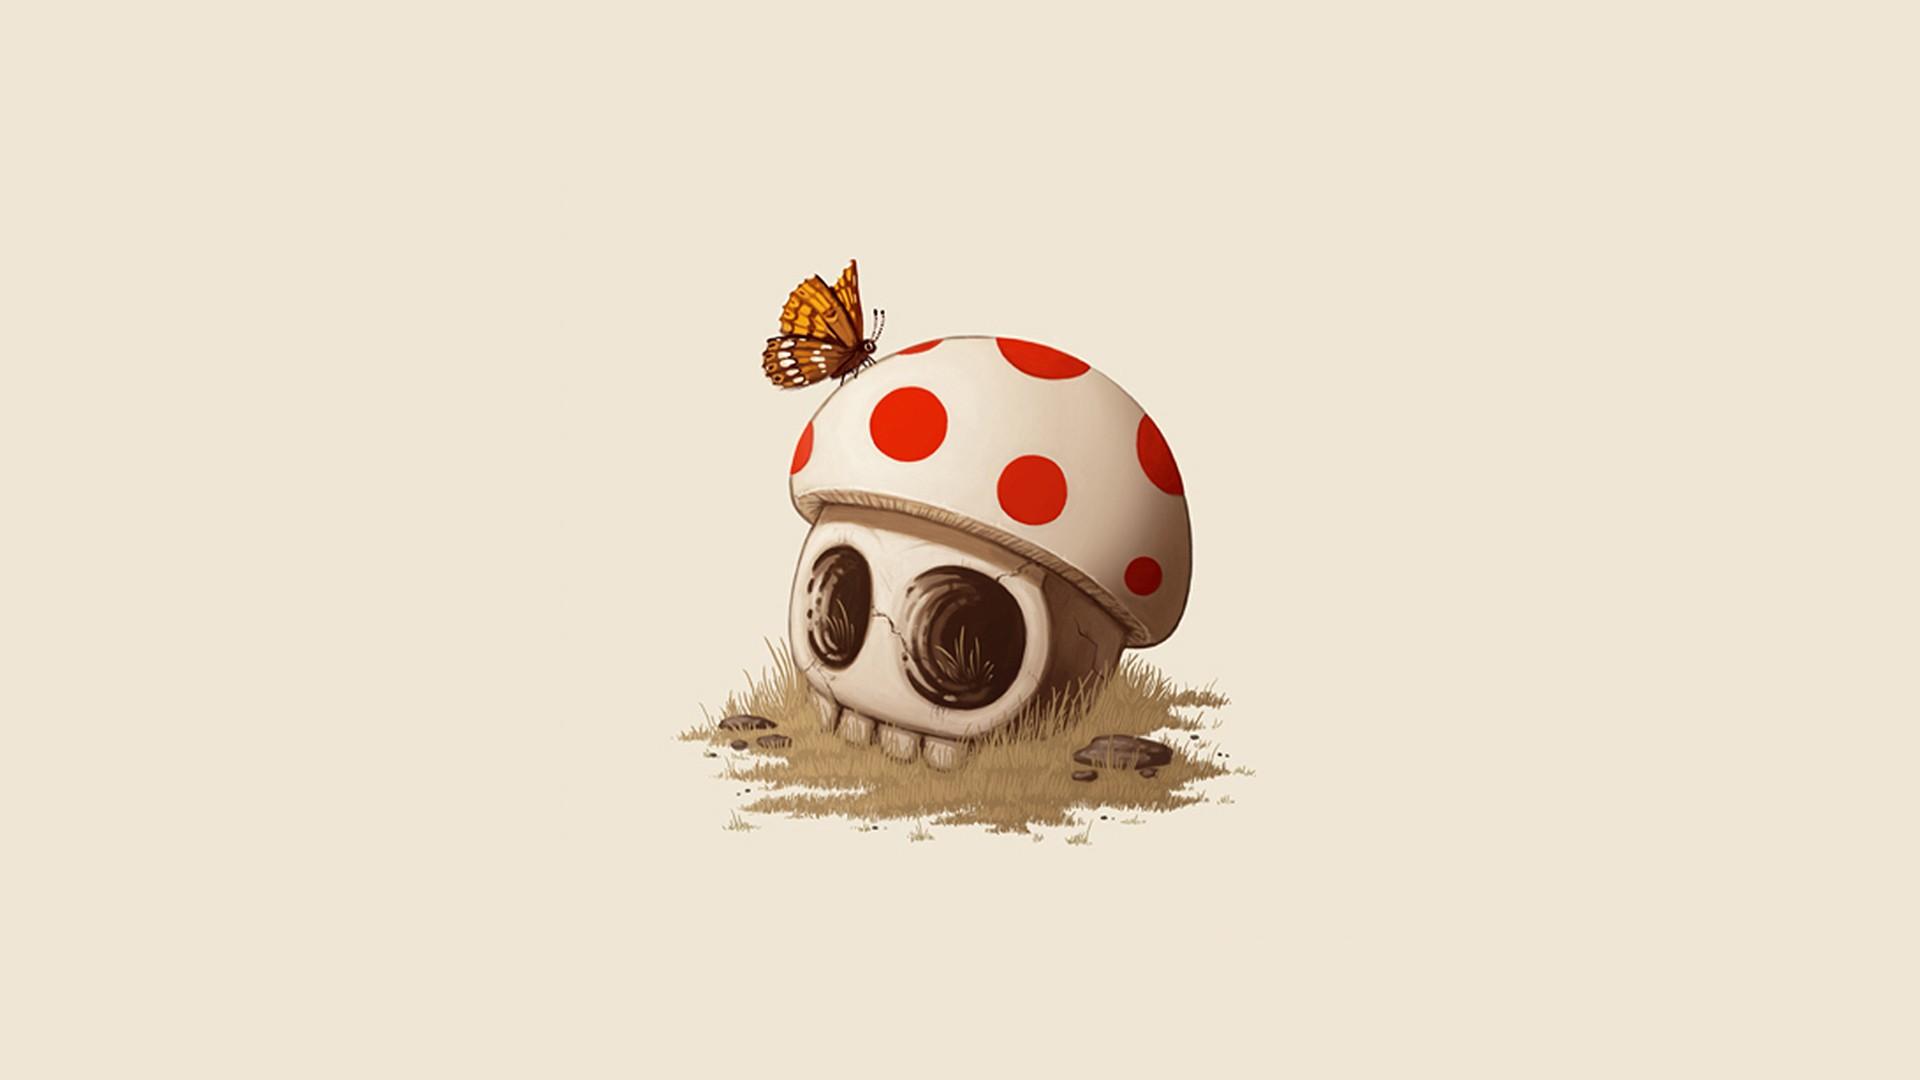 Tapety Ilustrace Videohry Hmyz Kreslena Pohadka Super Mario